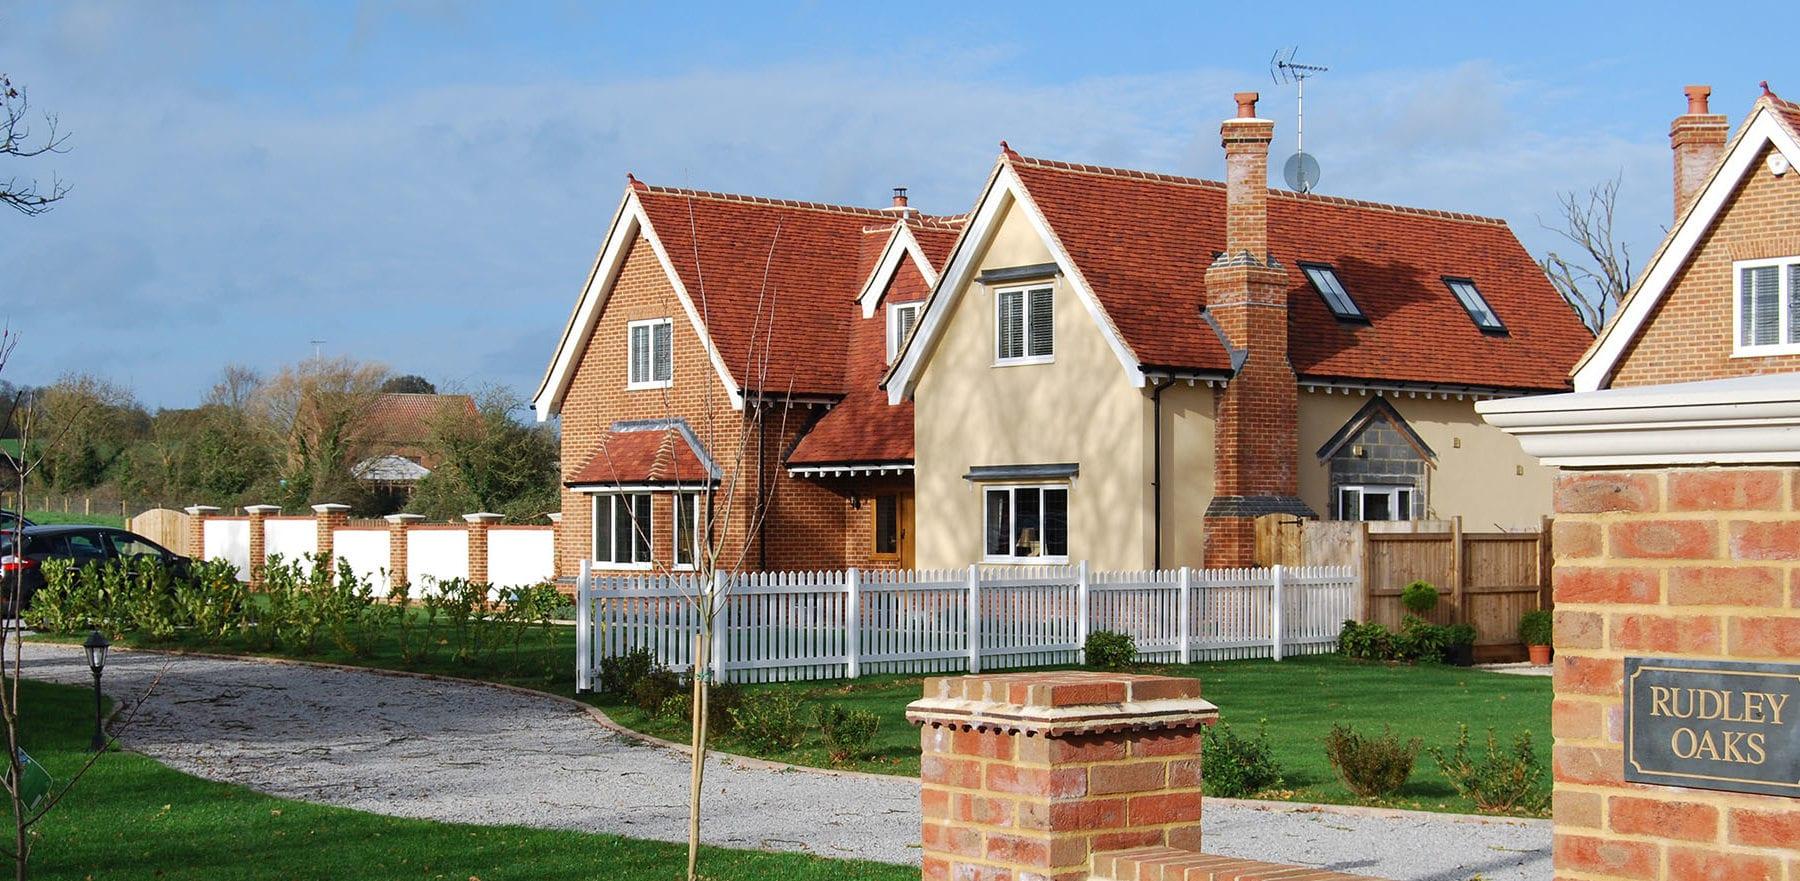 Lifestiles - Handmade Red Clay Roof Tiles - Rudley Oaks, England